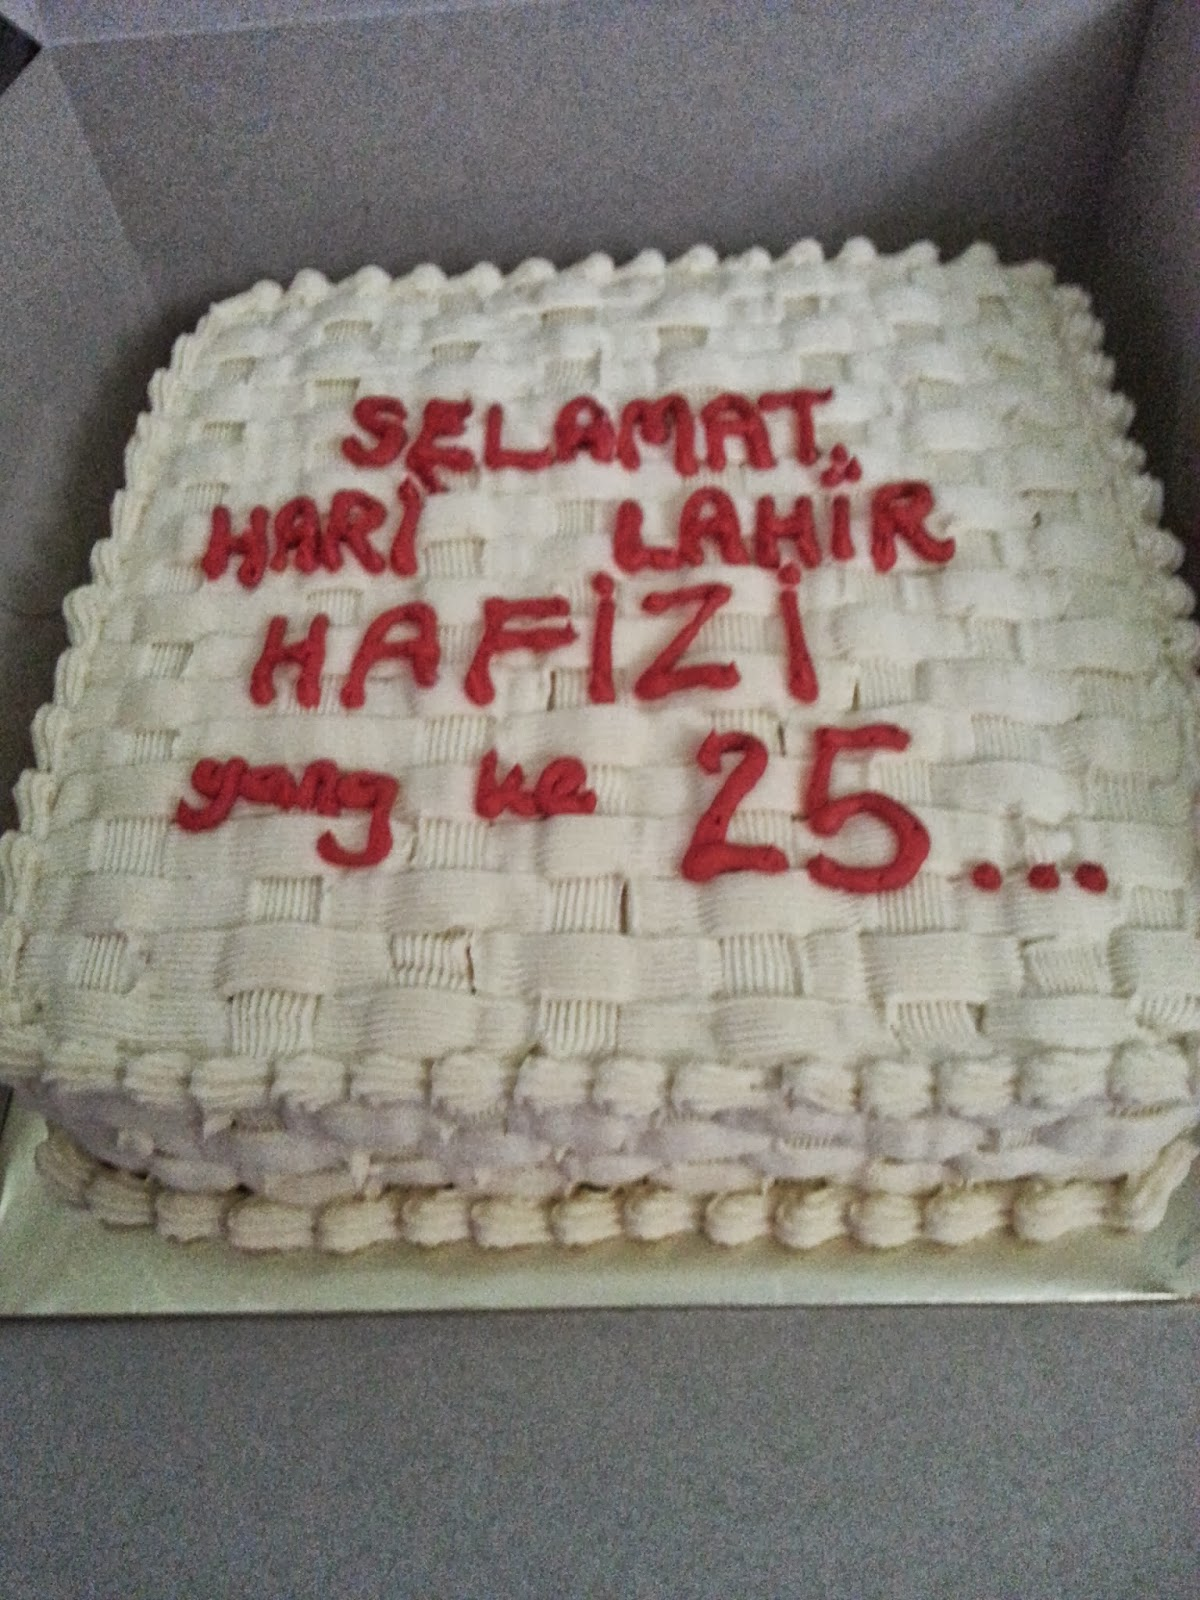 Cake Images With Name Hari : Bakerlicious Cupcakery: Selamat hari raya aidiladha